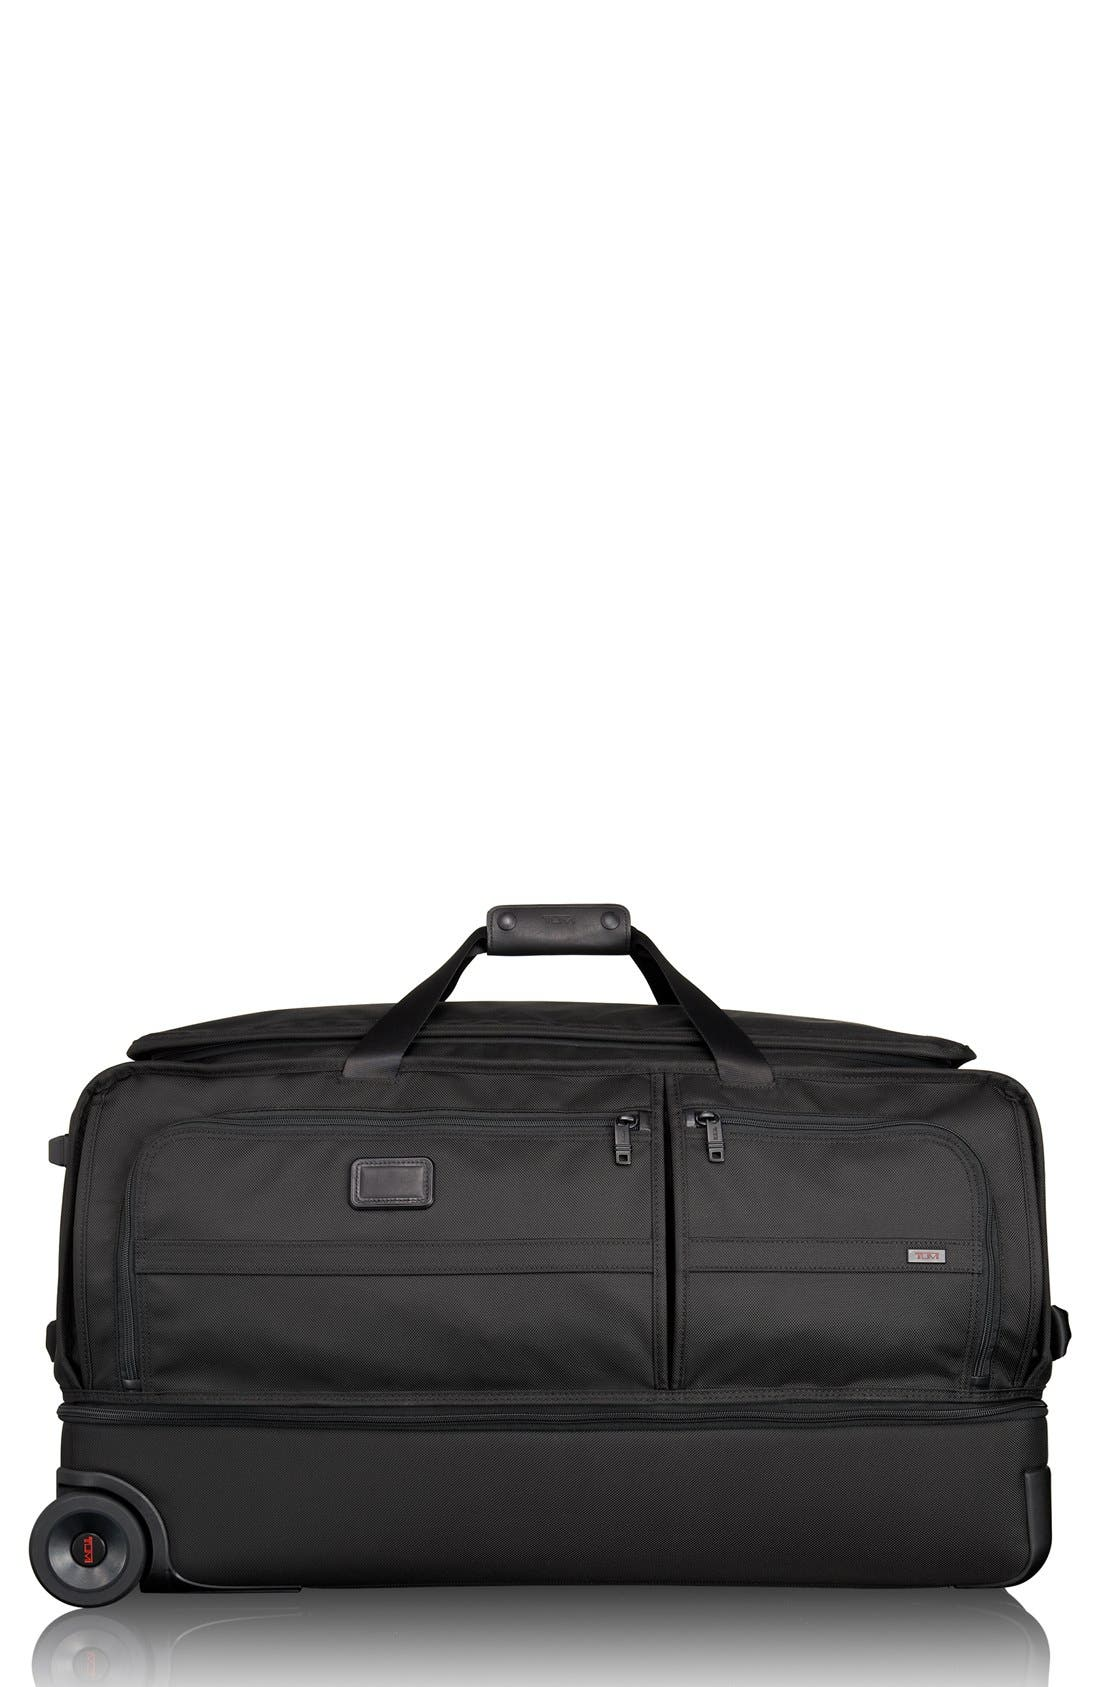 Alpha 2 31-Inch Rolling Two-Wheel Duffel Bag,                         Main,                         color, 007